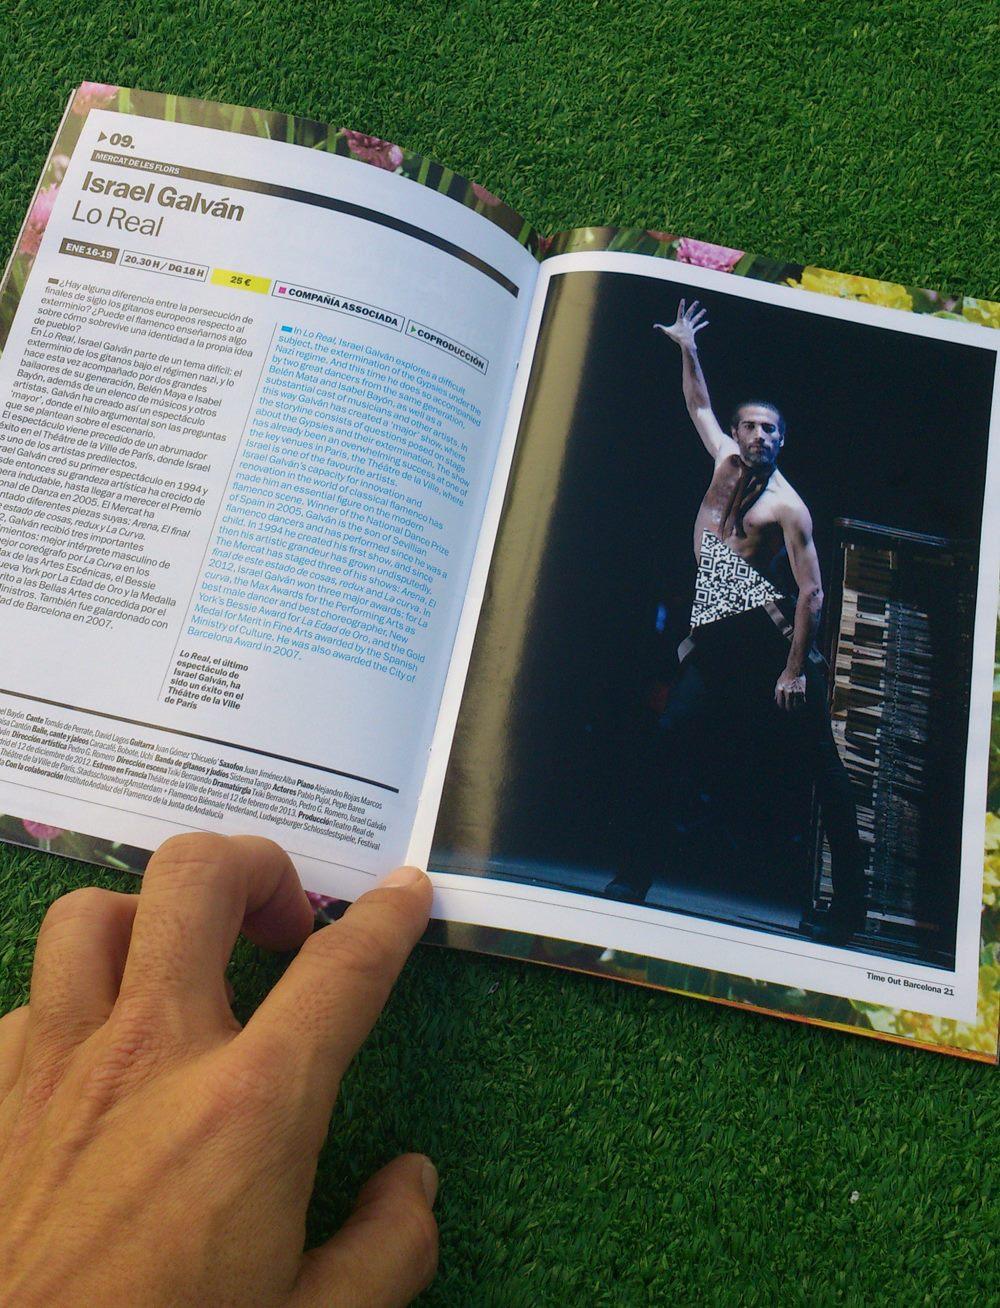 "Vamos a ver LO REAL de Israel Galván el jueves 16 de enero del 2014 en el Mercat de les Flors. El ""outsider"" del flamenco nos bailará loimbailable."